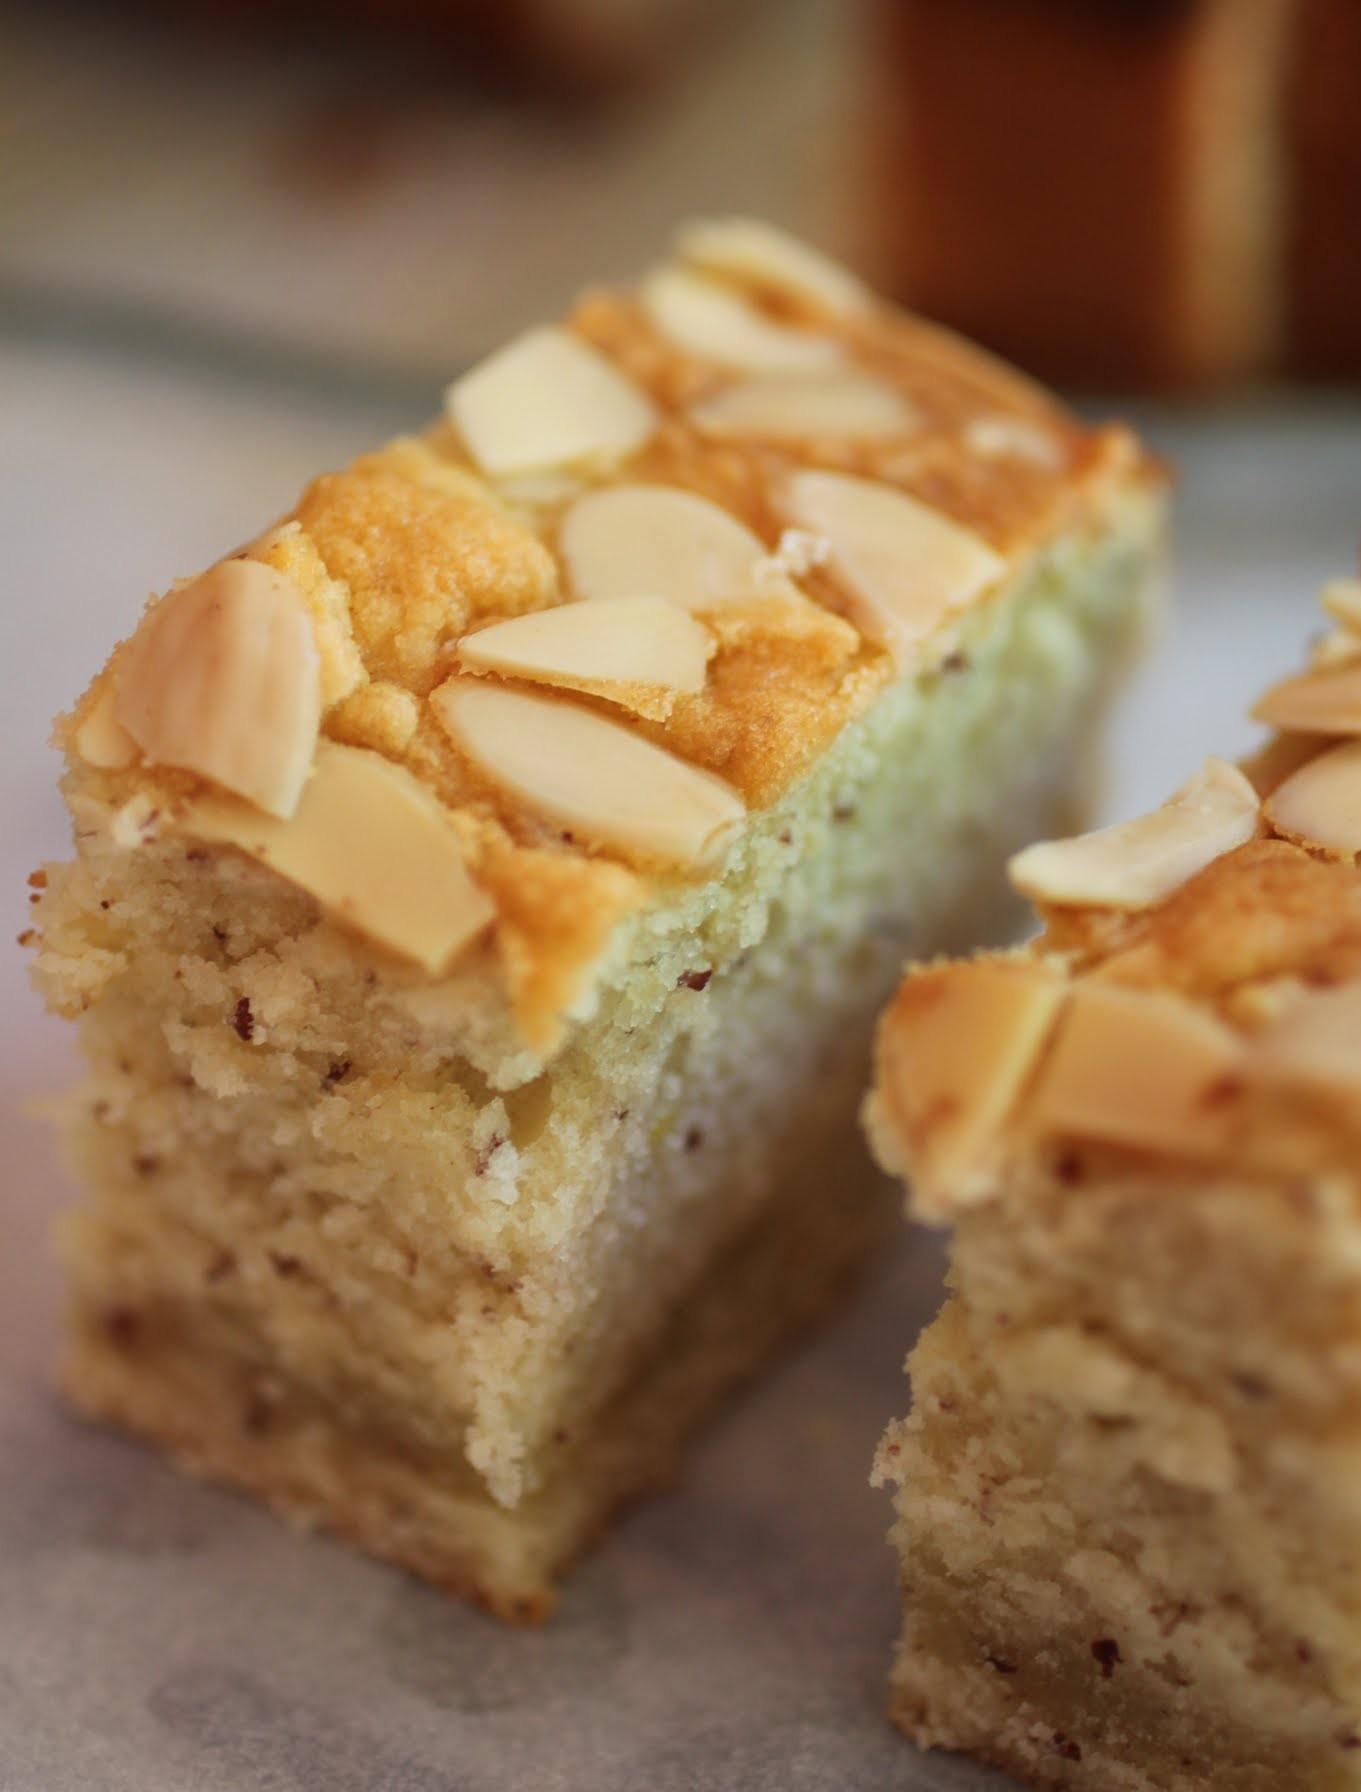 Almond Half-Pound Cake